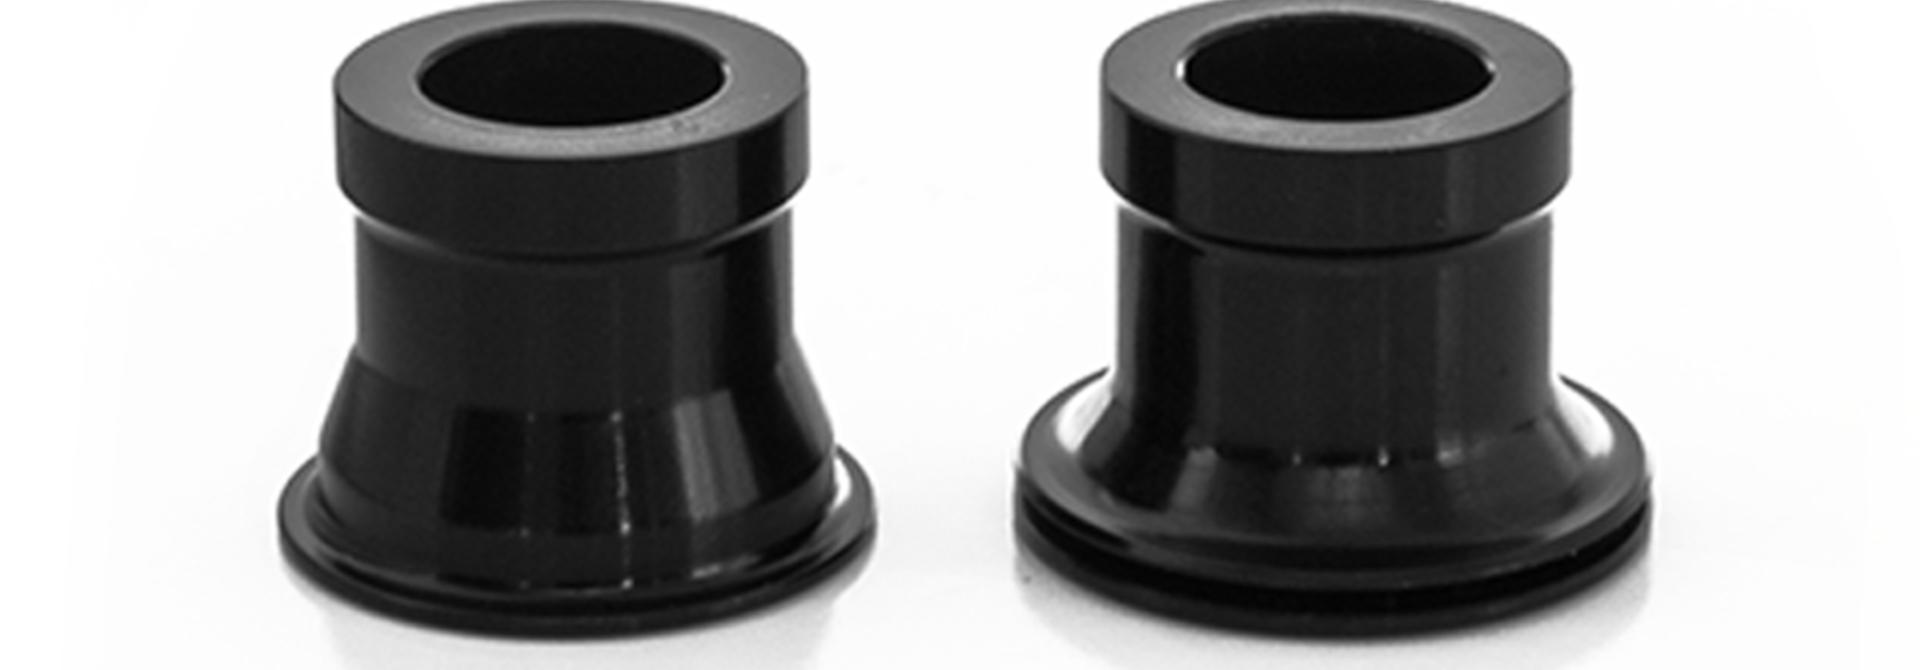 I9 1/1 & Centre Lock Rear 12X148mm Endcaps (For Microspline) (OEKMA16)